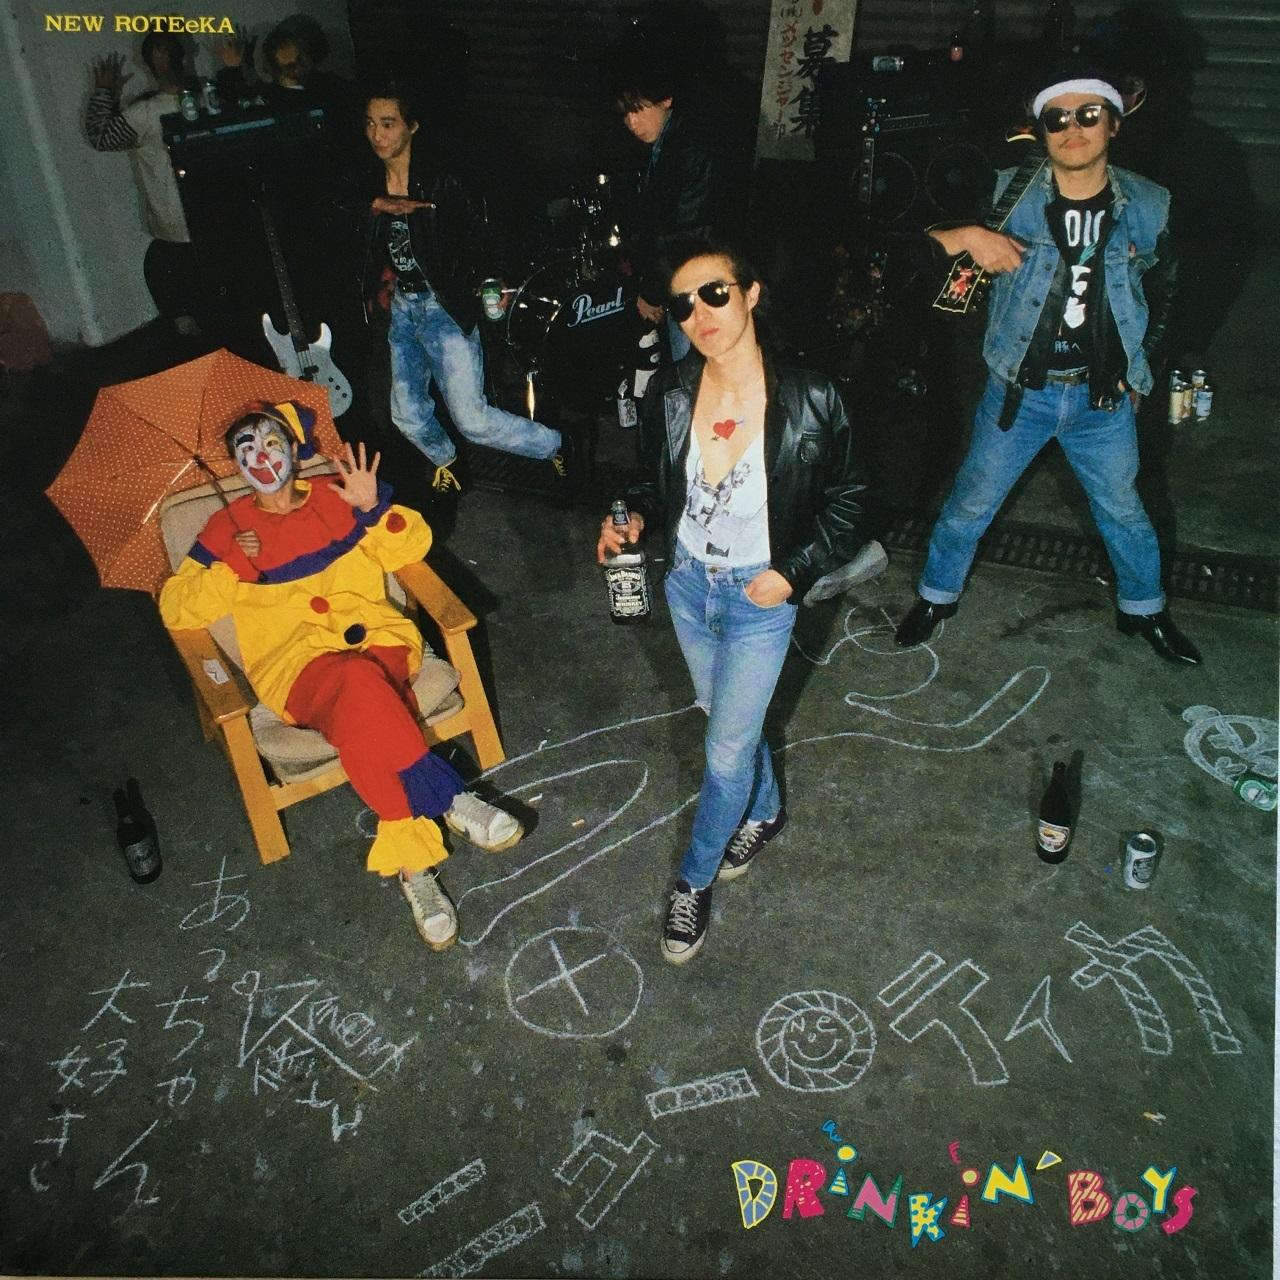 【12inch・国内盤】NEW ROTEeKA(ニュー・ロティカ)/ Drinkin' Boys